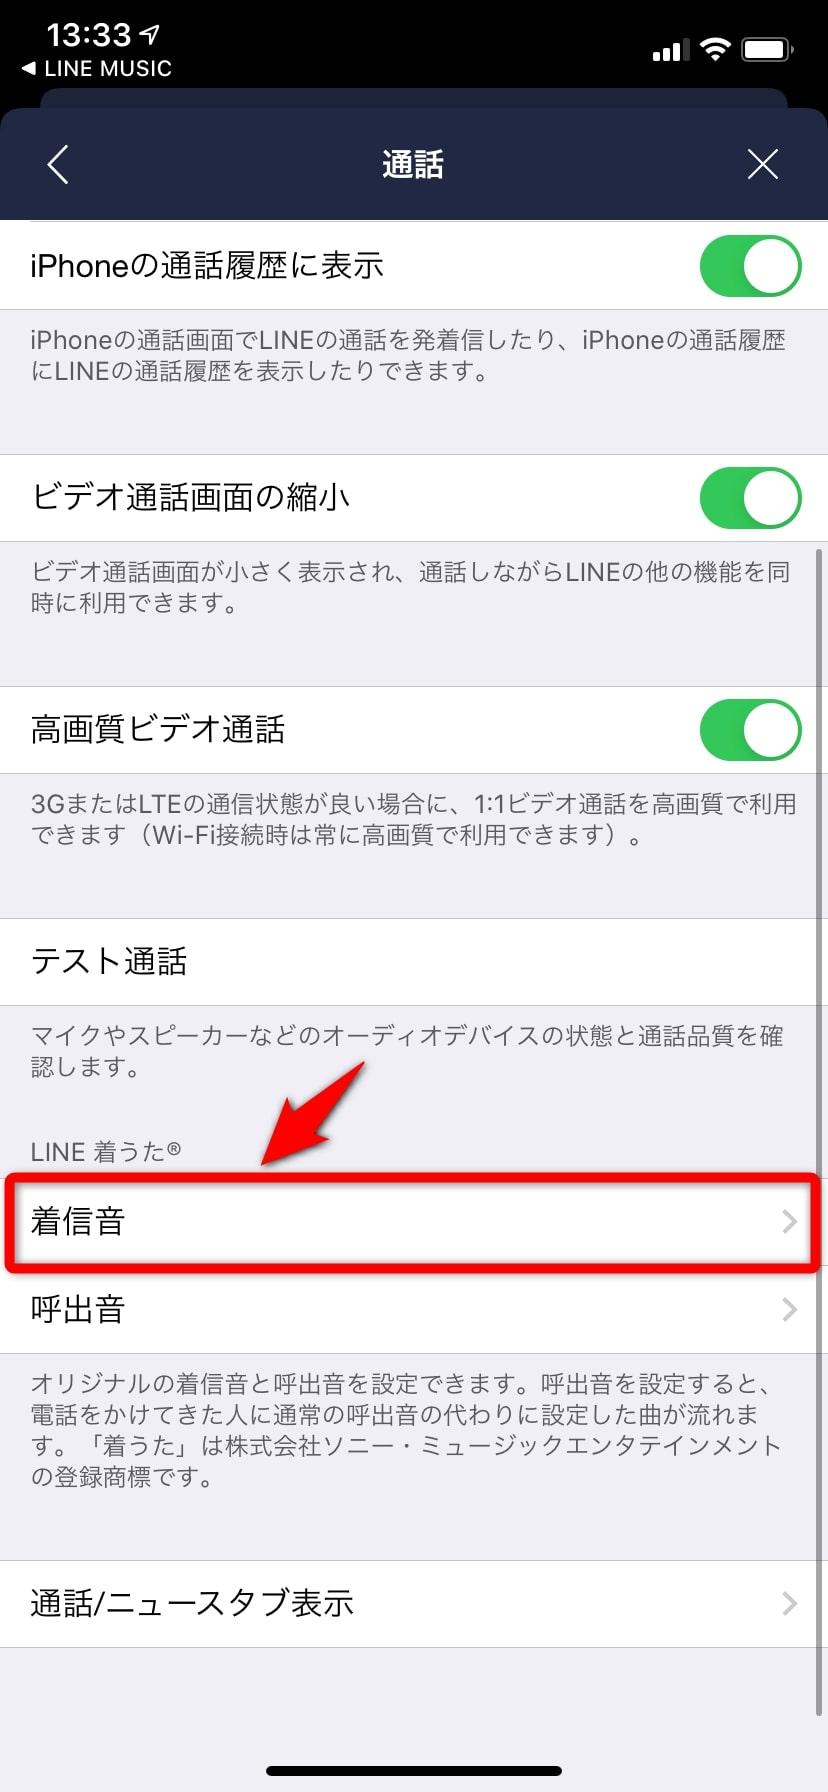 LINEの着信音、呼出音をLINE MUSICの好きな曲に設定する方法【無料でもOK】